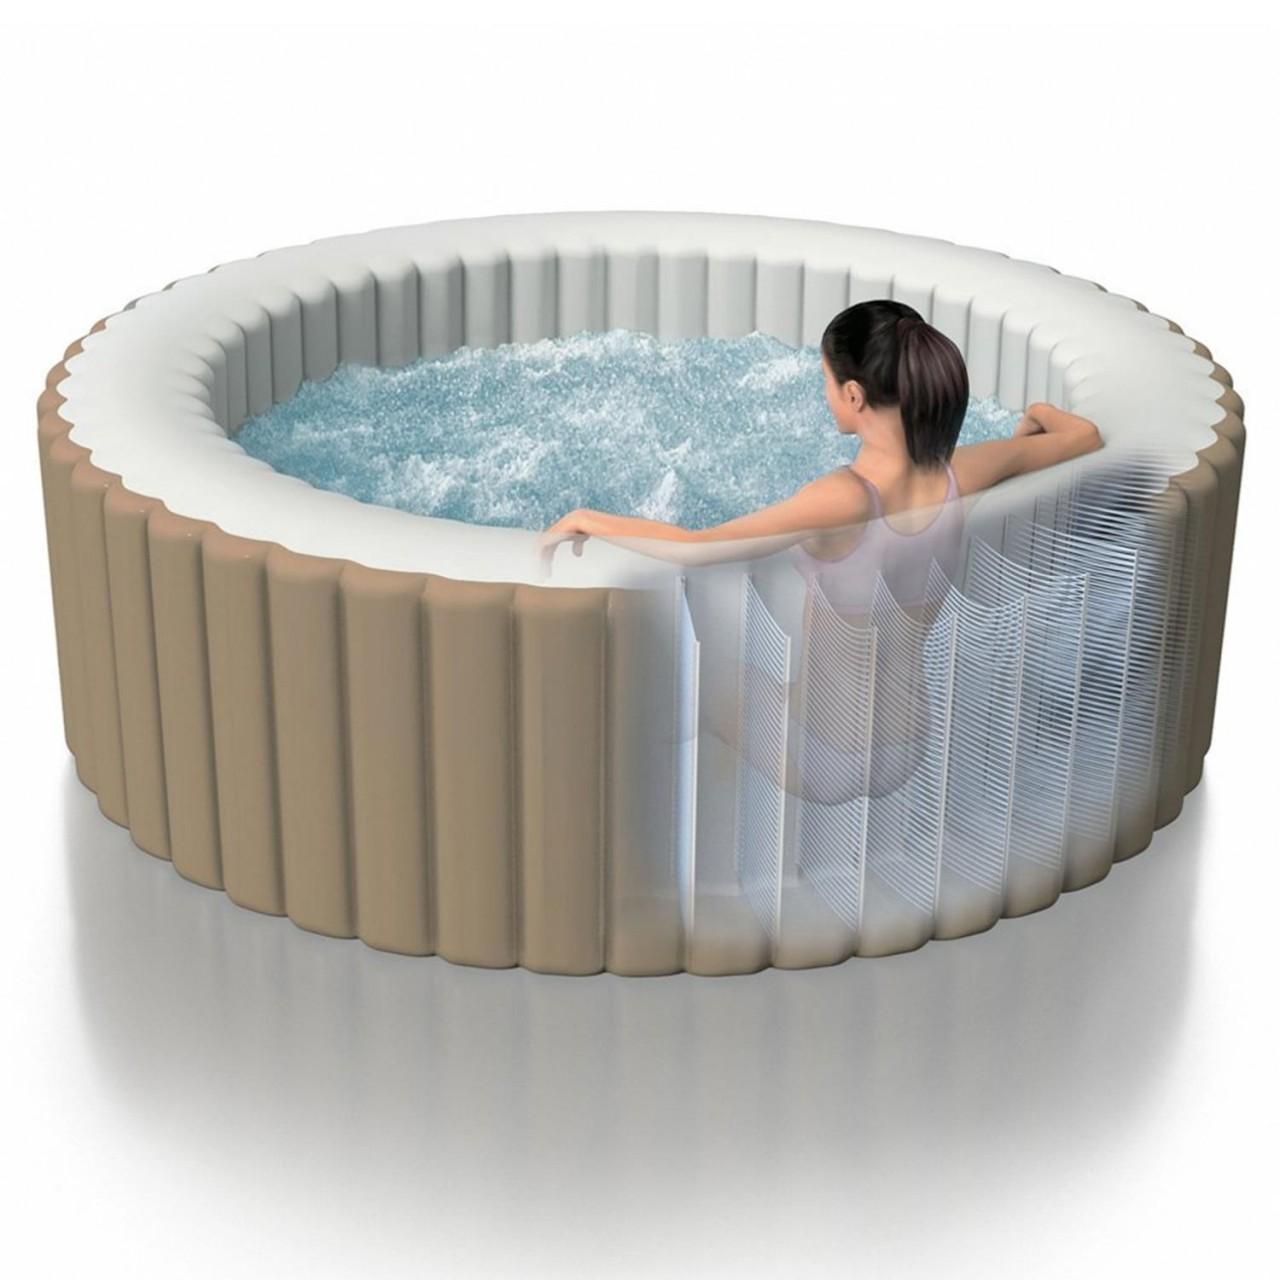 Intex 28408 Whirlpool Pure Spa Jacuzzi Heizung Spa Pool 216X71 cm 4 Personen